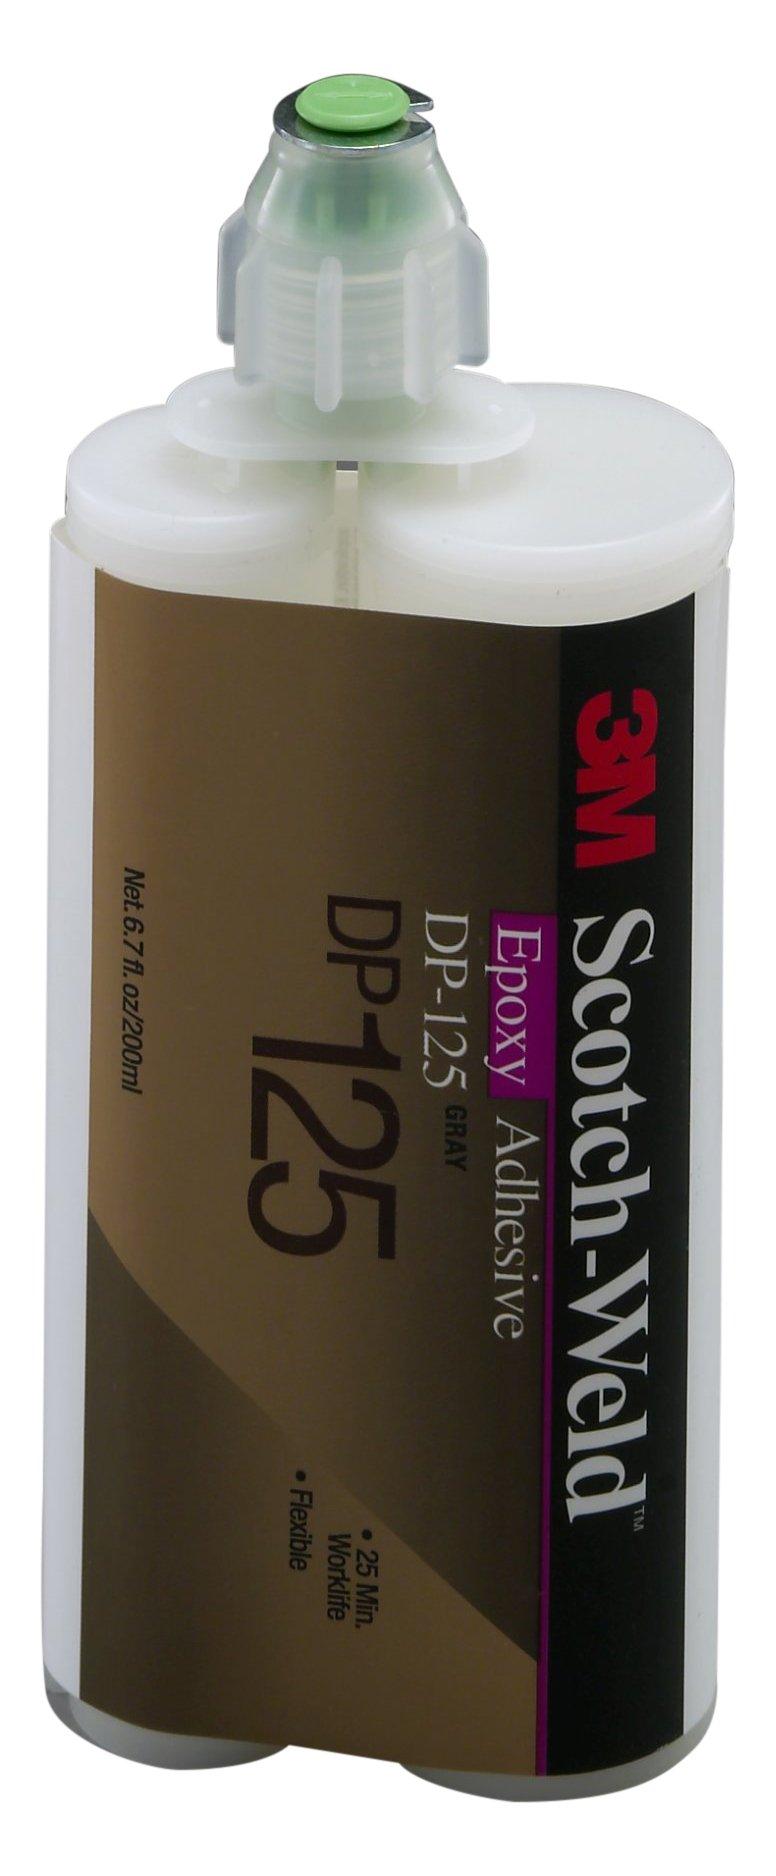 3M Scotch-Weld 87844 Epoxy Adhesive DP125, 200 mL, Gray, 6.763 fl. oz. by 3M Scotch-Weld